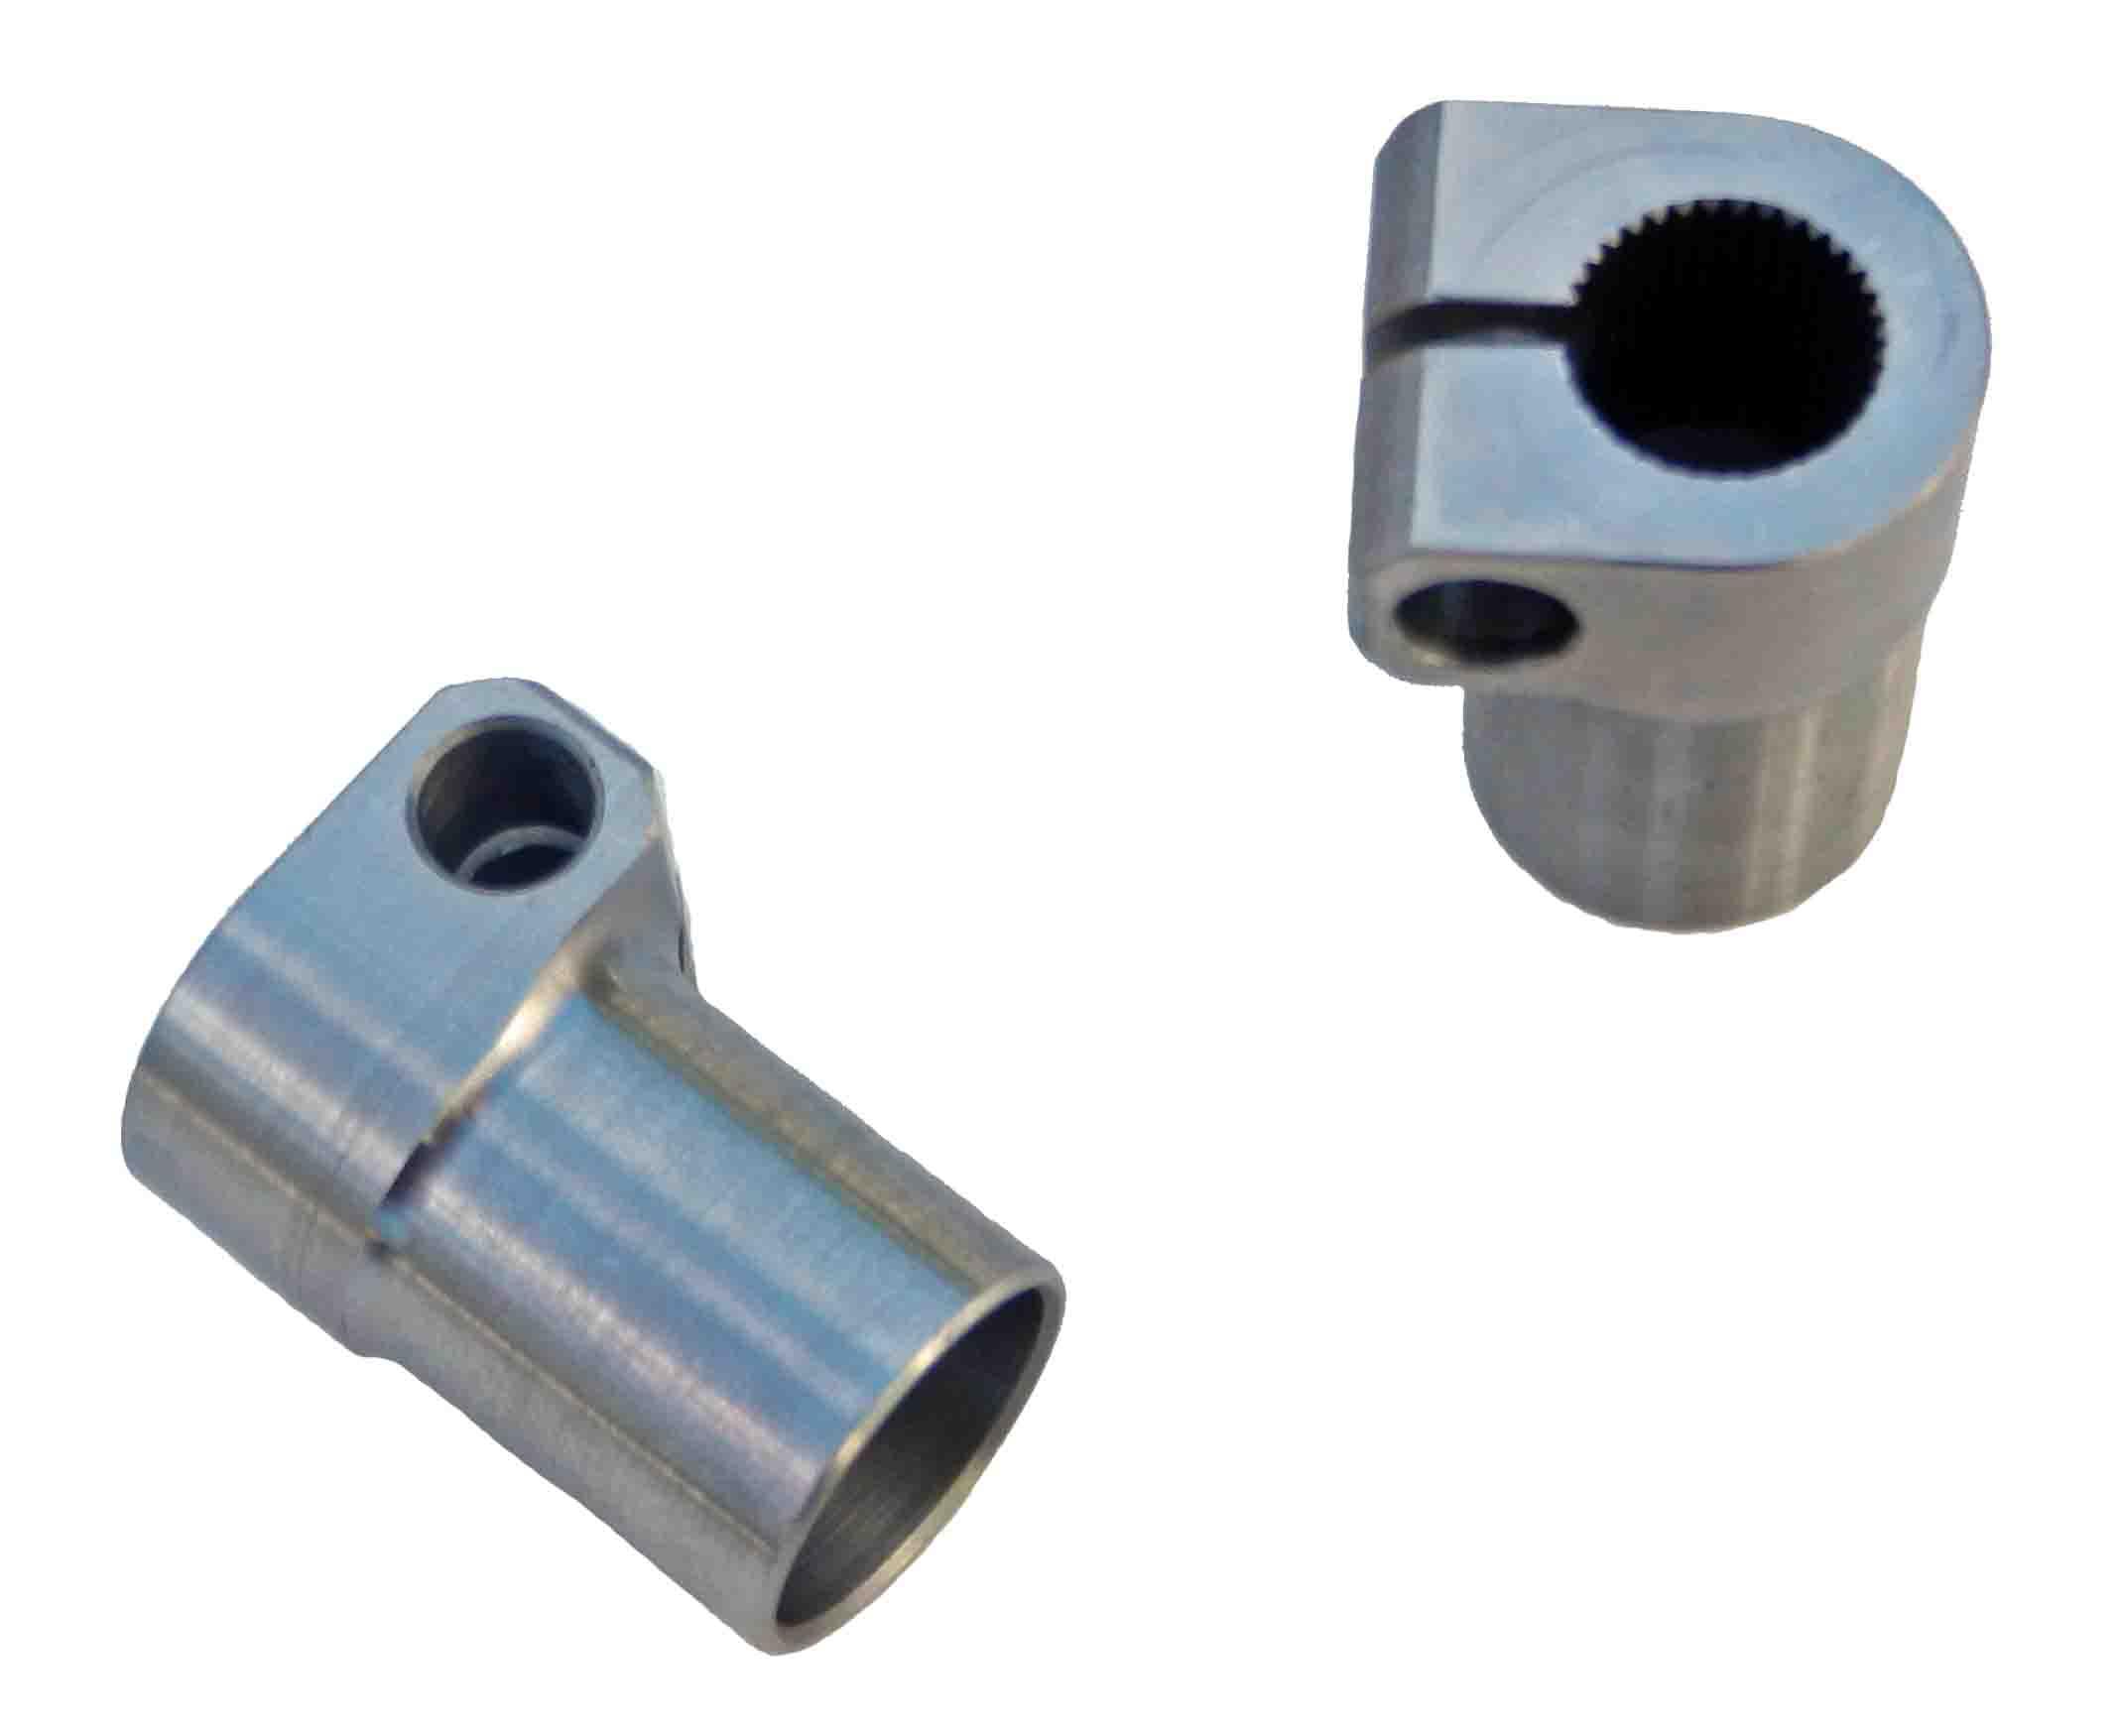 straight-coupler-5-8-13-16-inch-id-epas06-epa07-.jpg